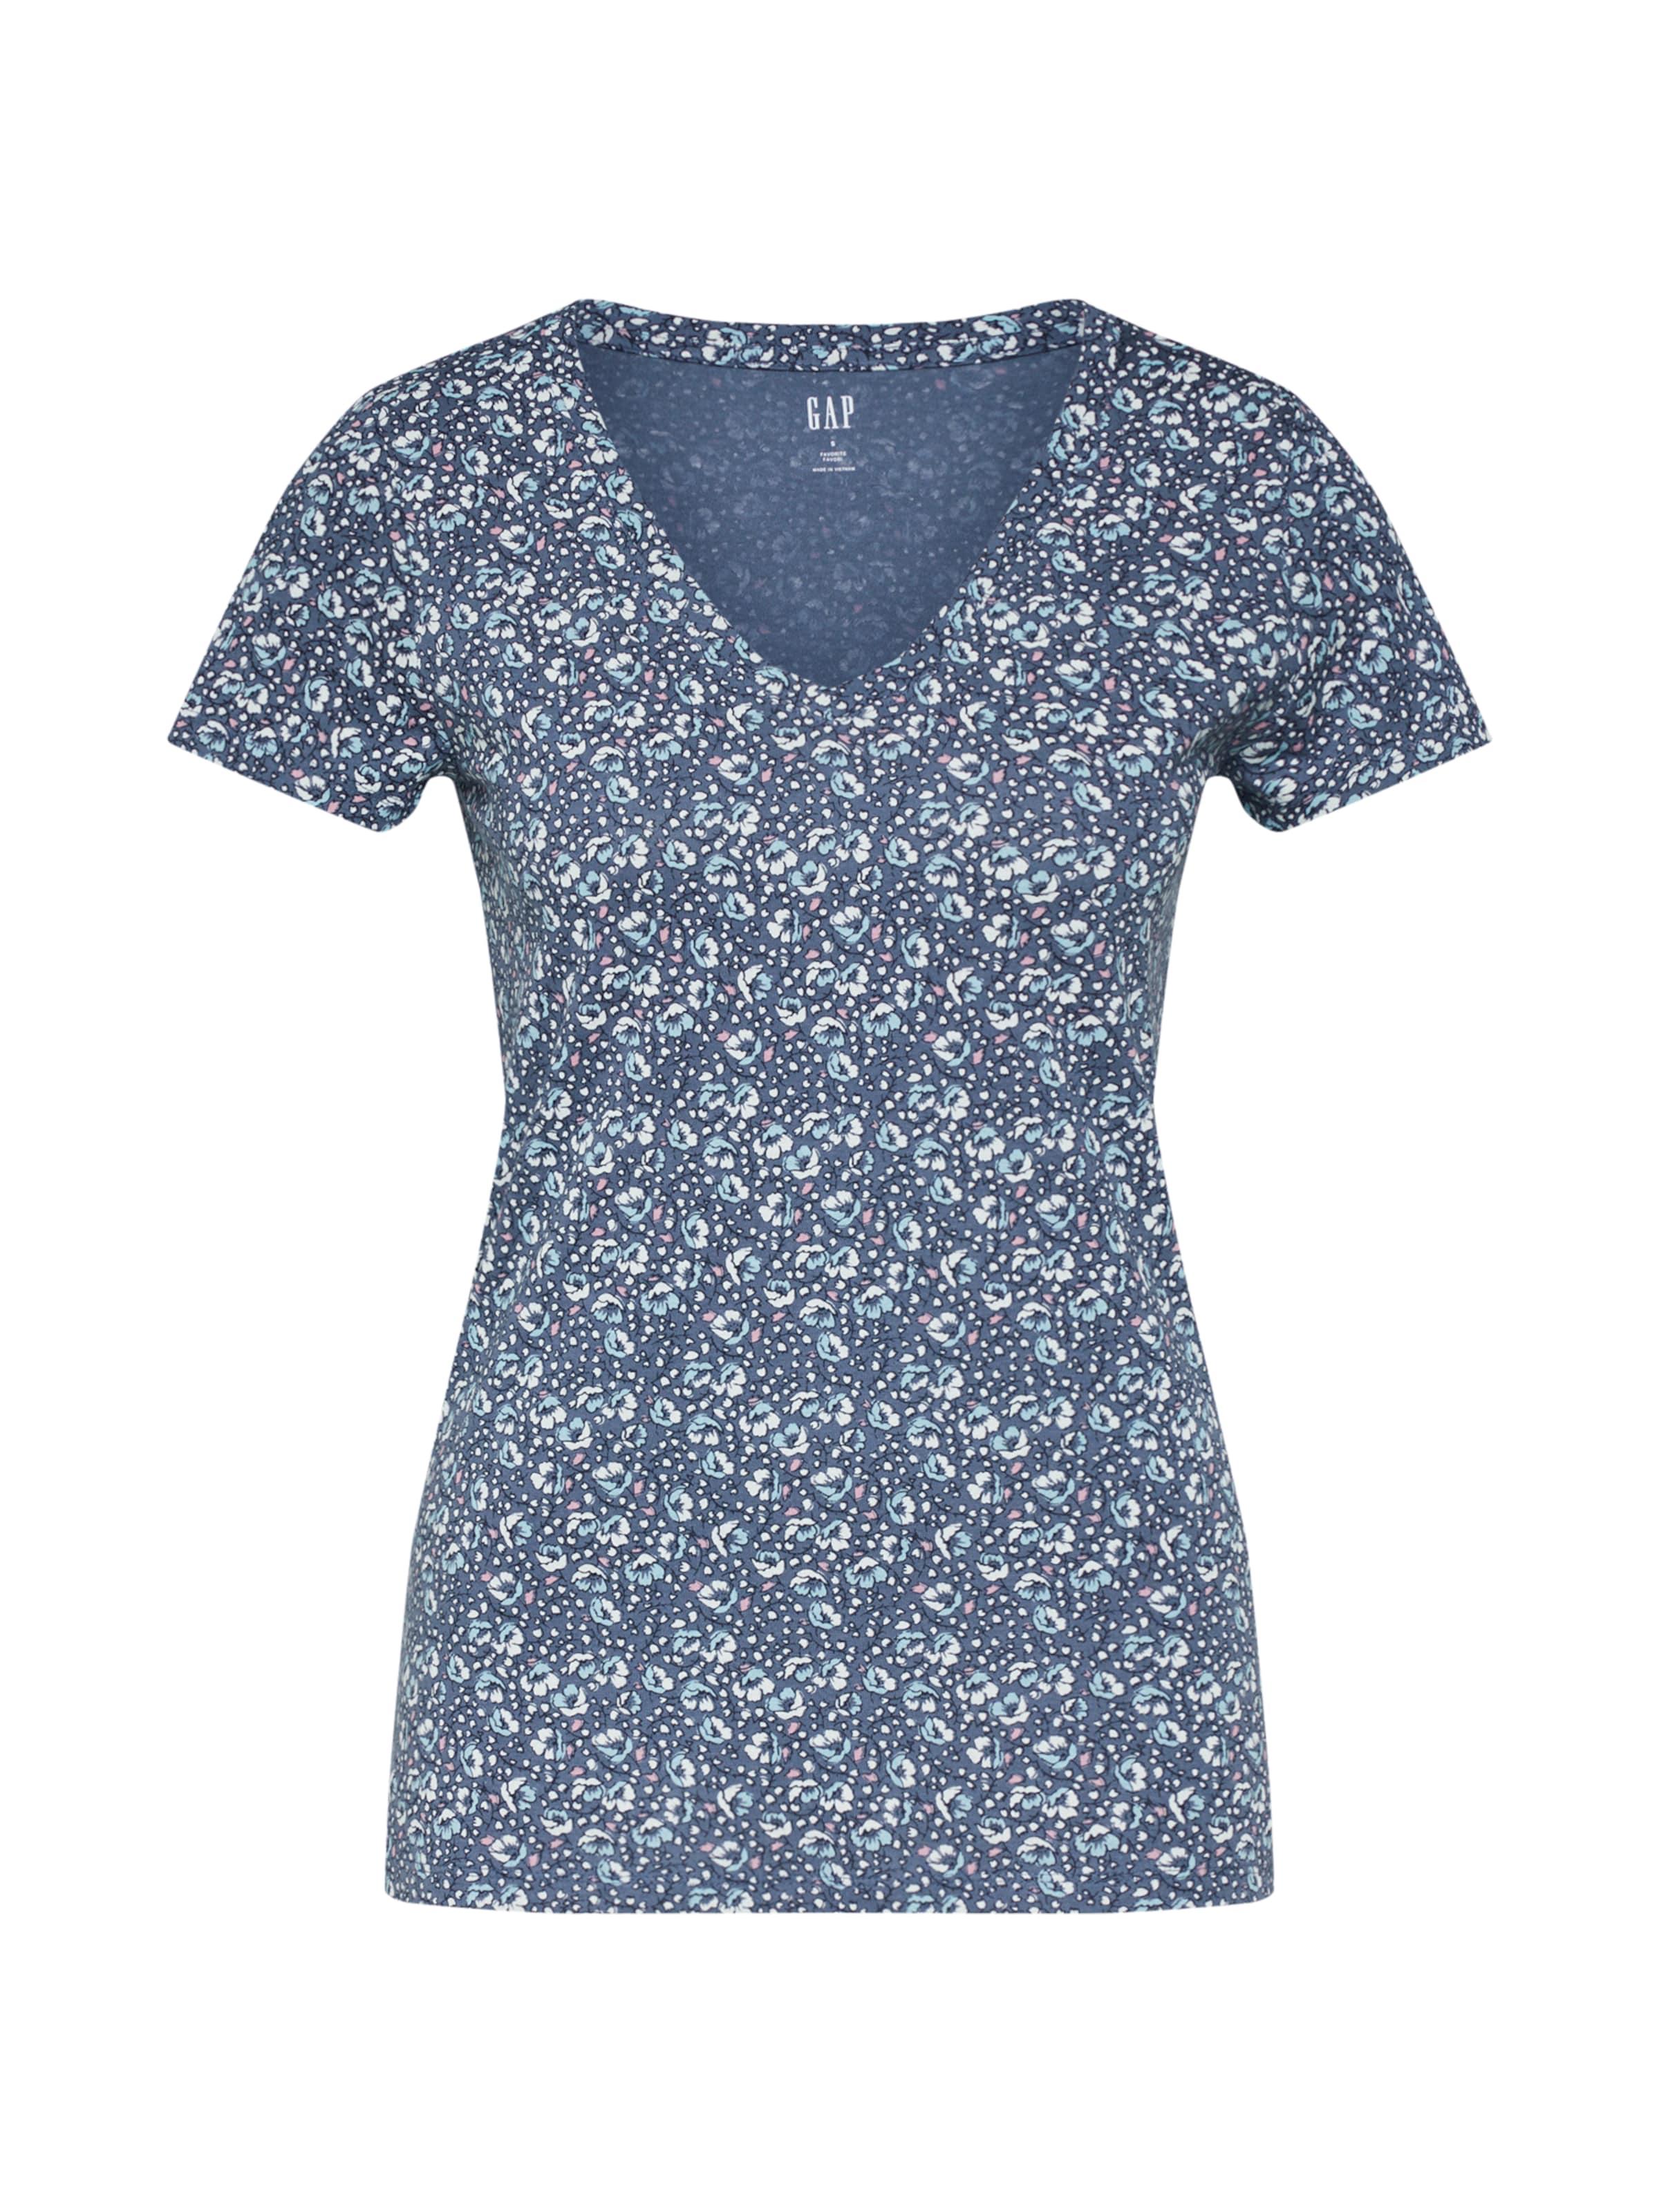 Gap shirt shirt shirt En Gap T T Gap RougeBlanc T En RougeBlanc dthQxsCBr